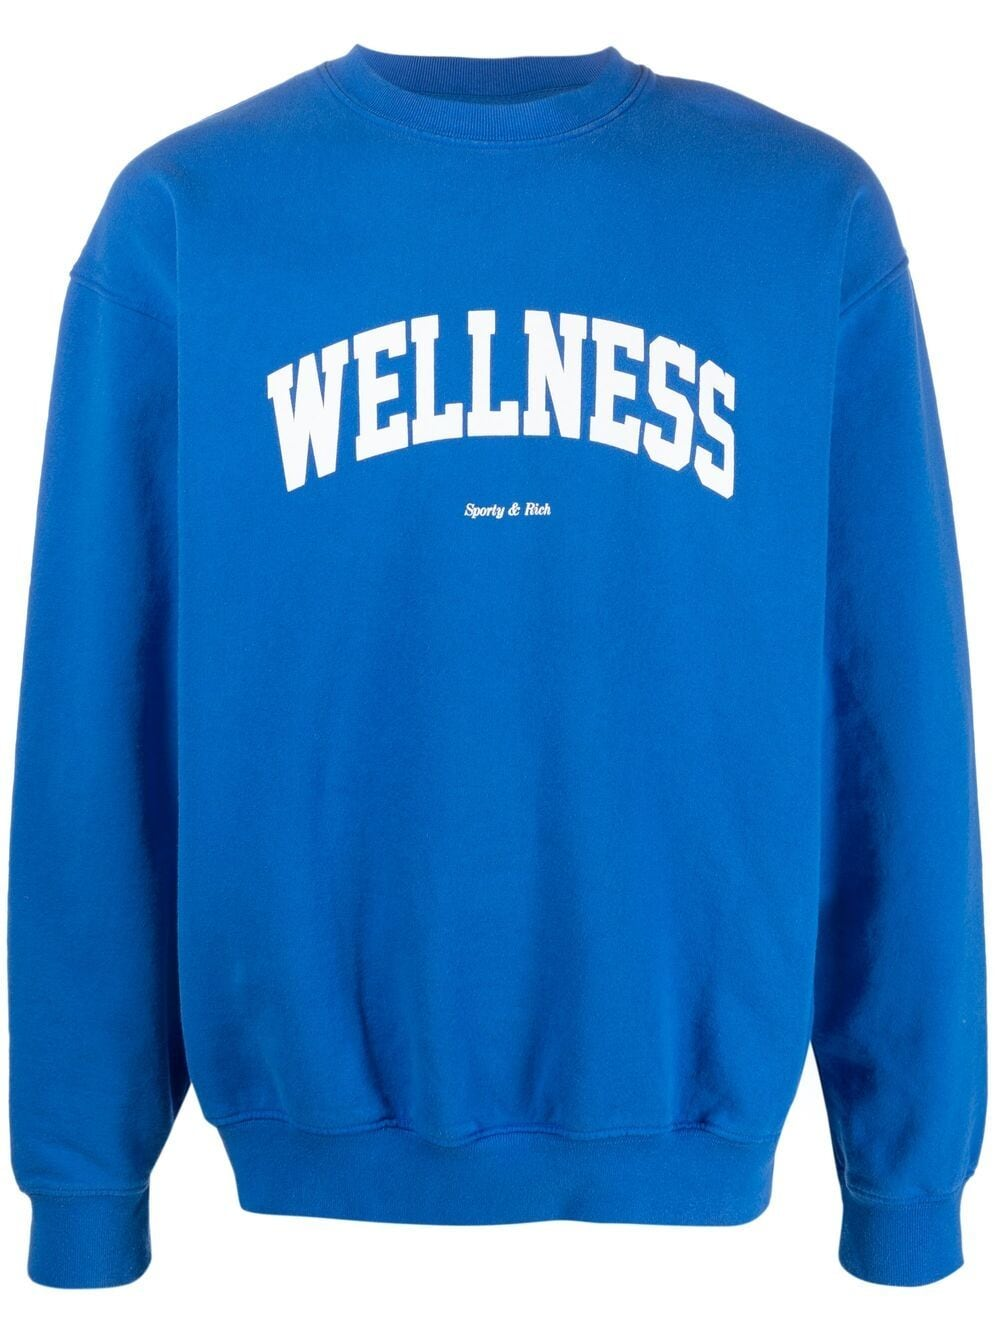 Sporty & Rich felpa a girocollo wellness unisex blu SPORTY & RICH | Felpe | CR091PR